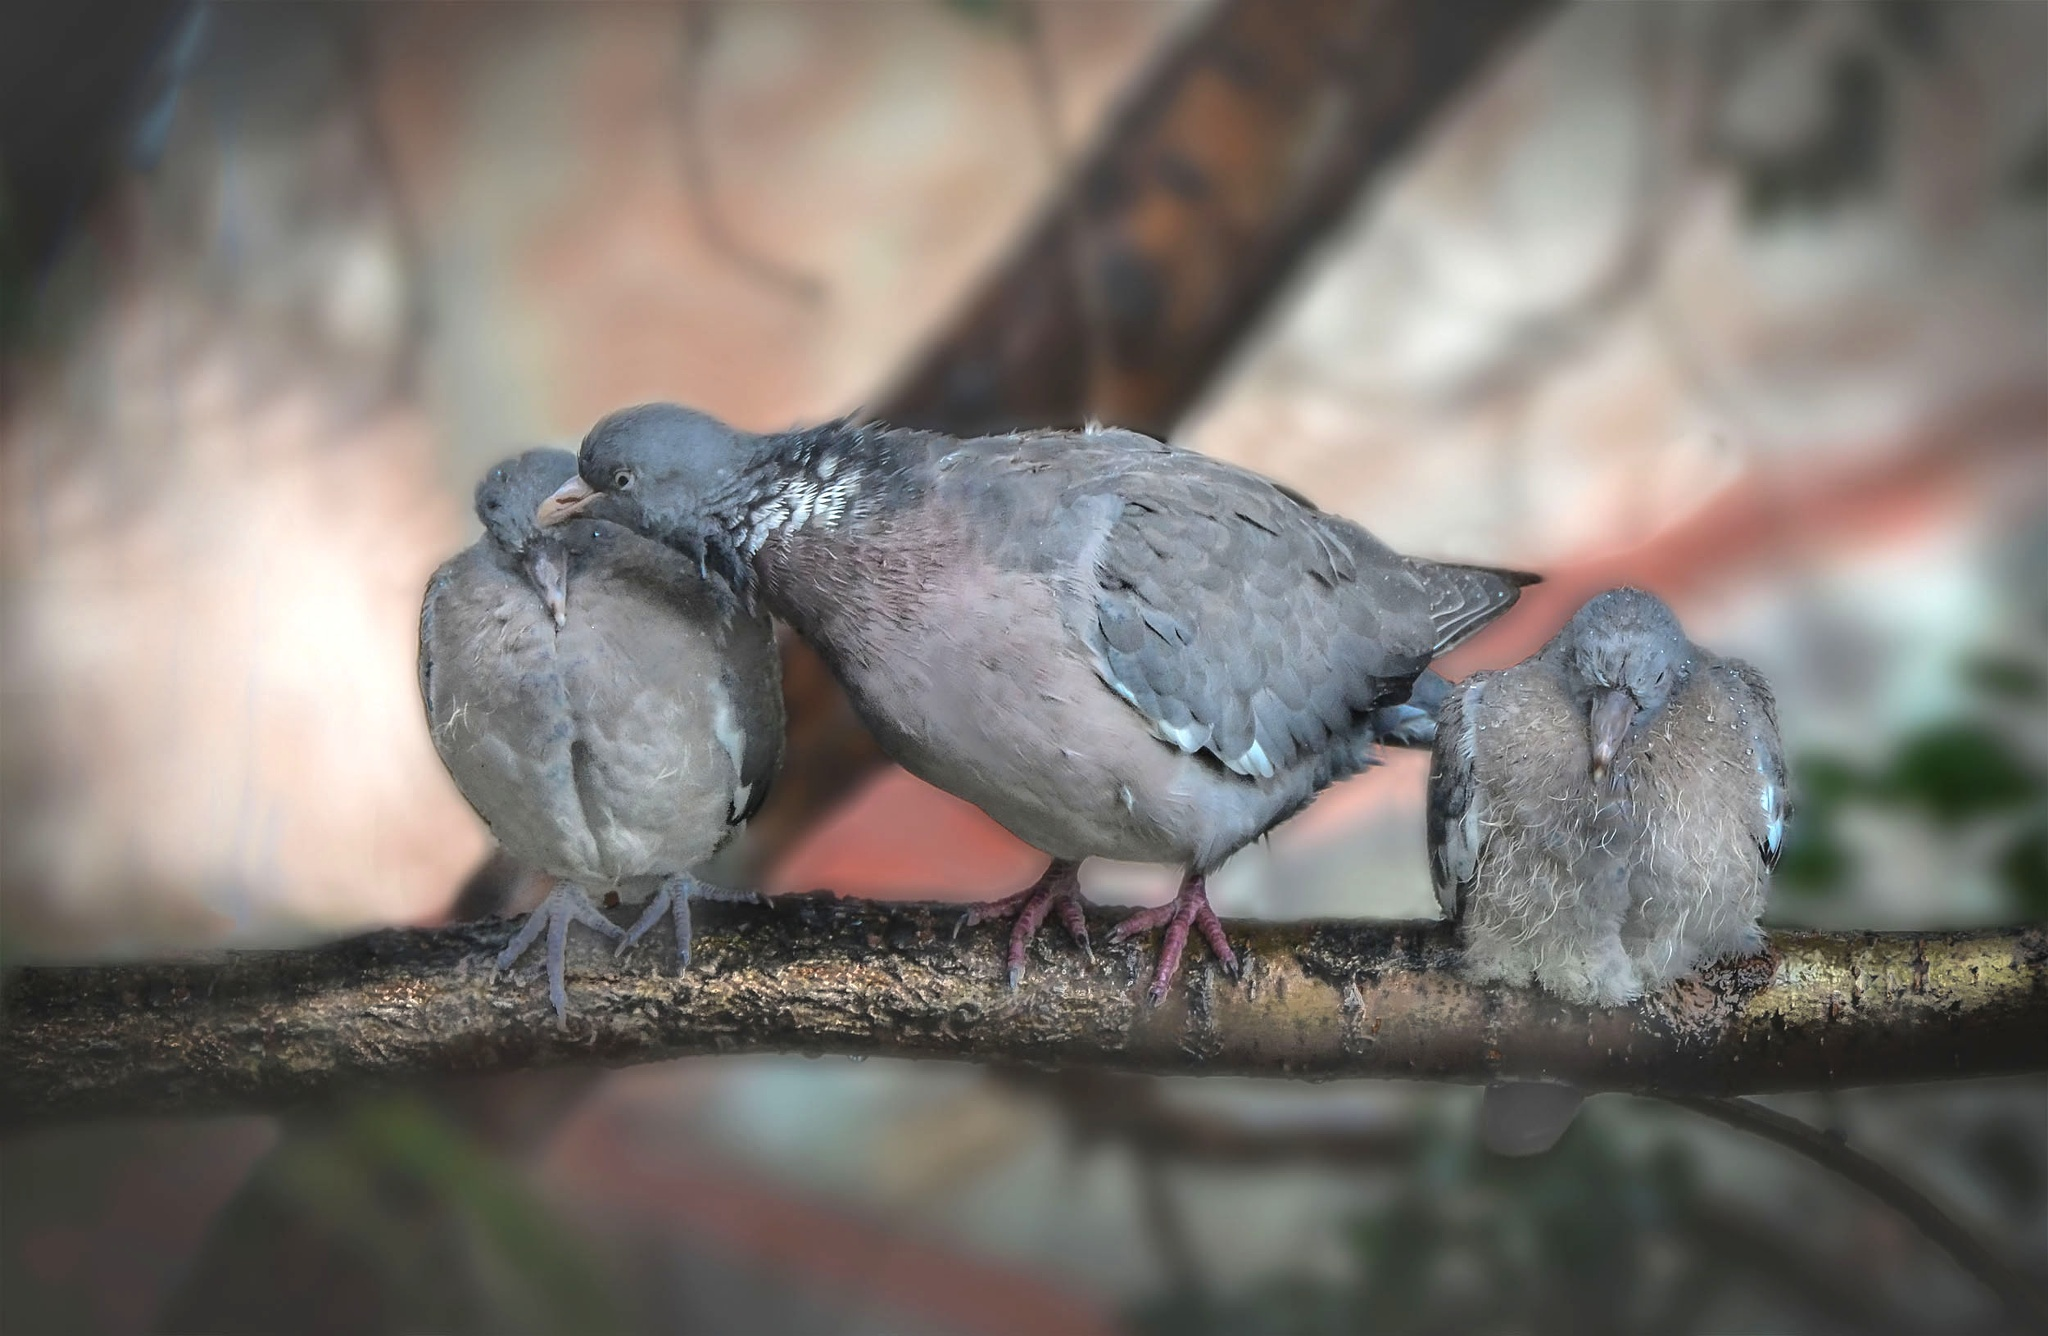 wet families by Tanasije Savic